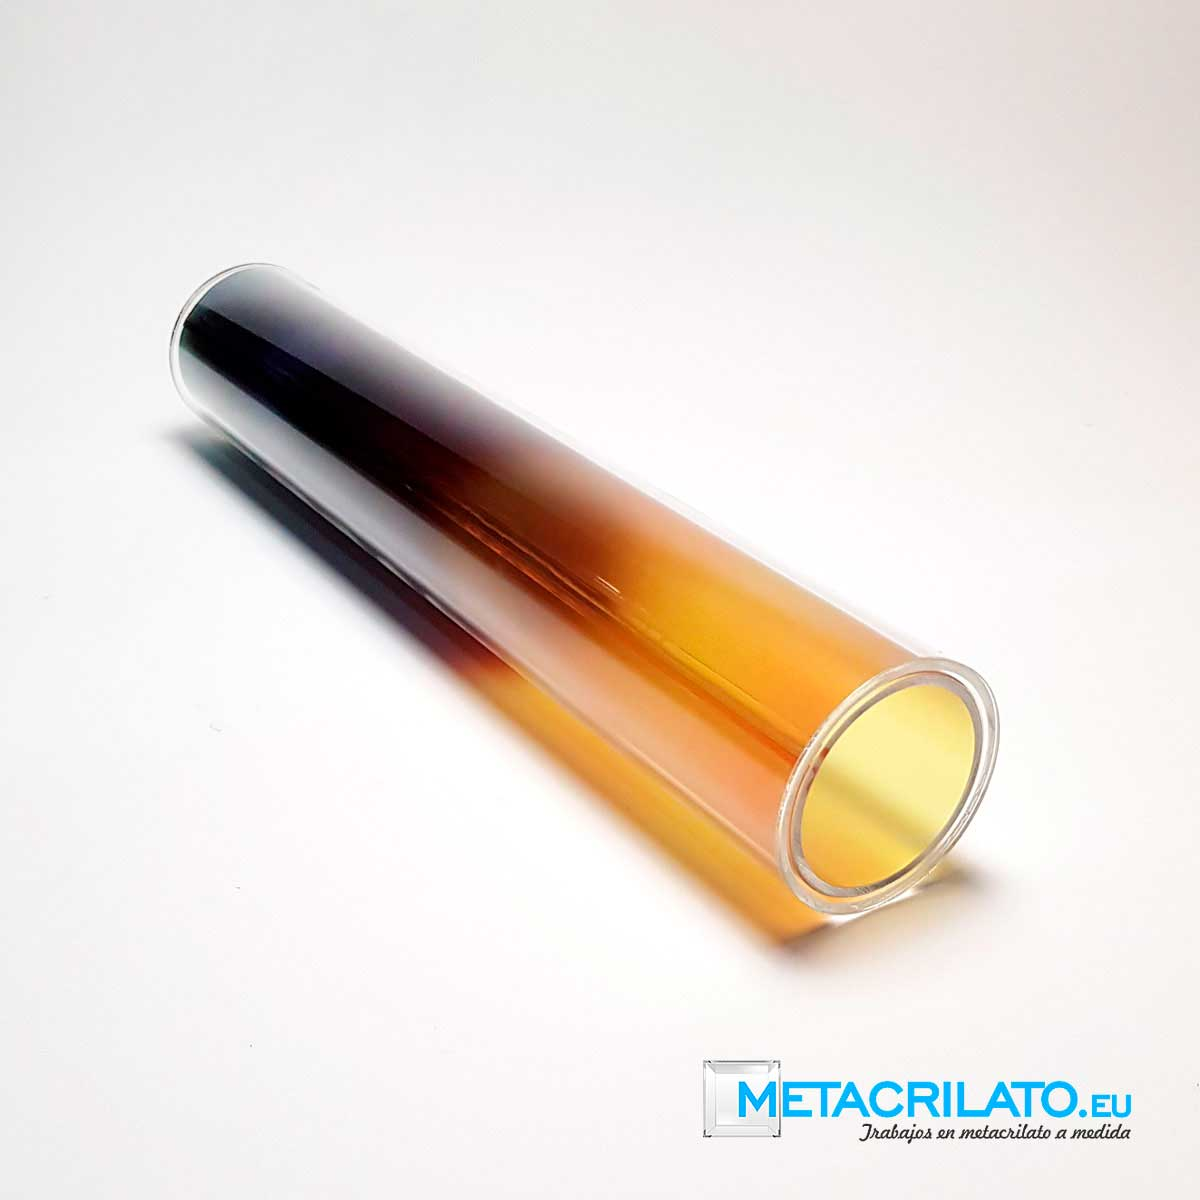 Tubo metacrilato